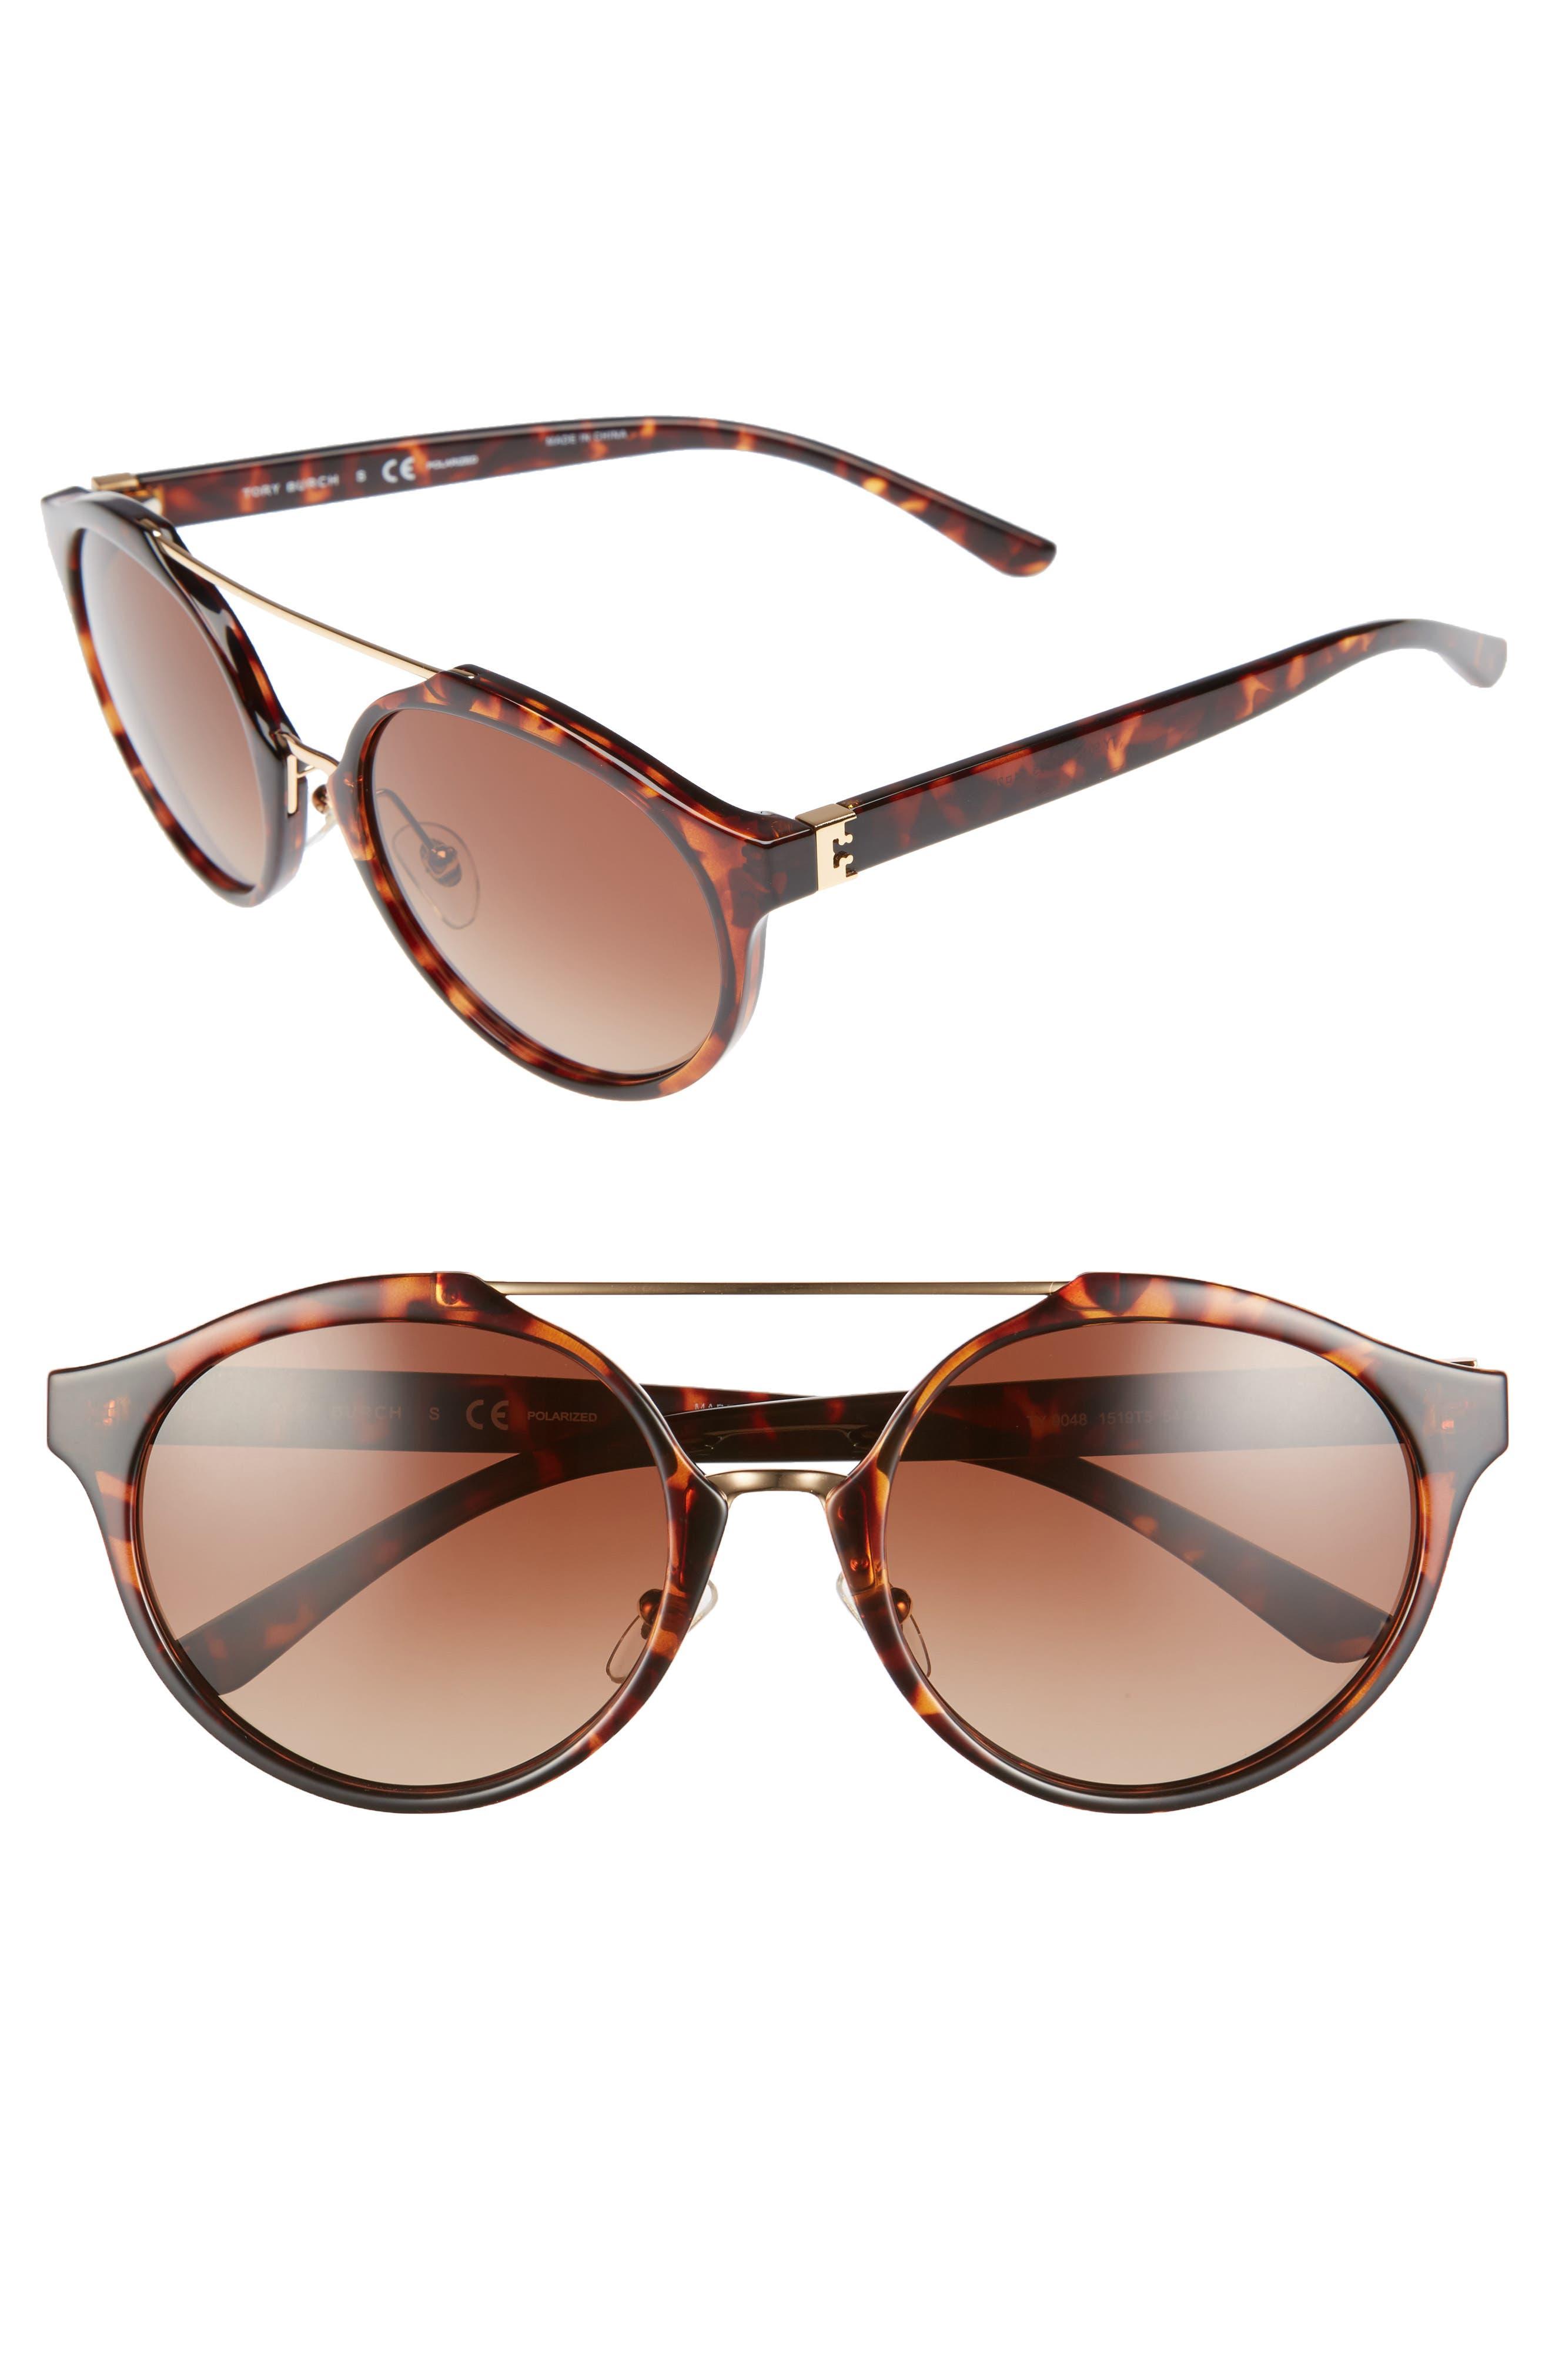 54mm Polarized Sunglasses,                         Main,                         color, 200